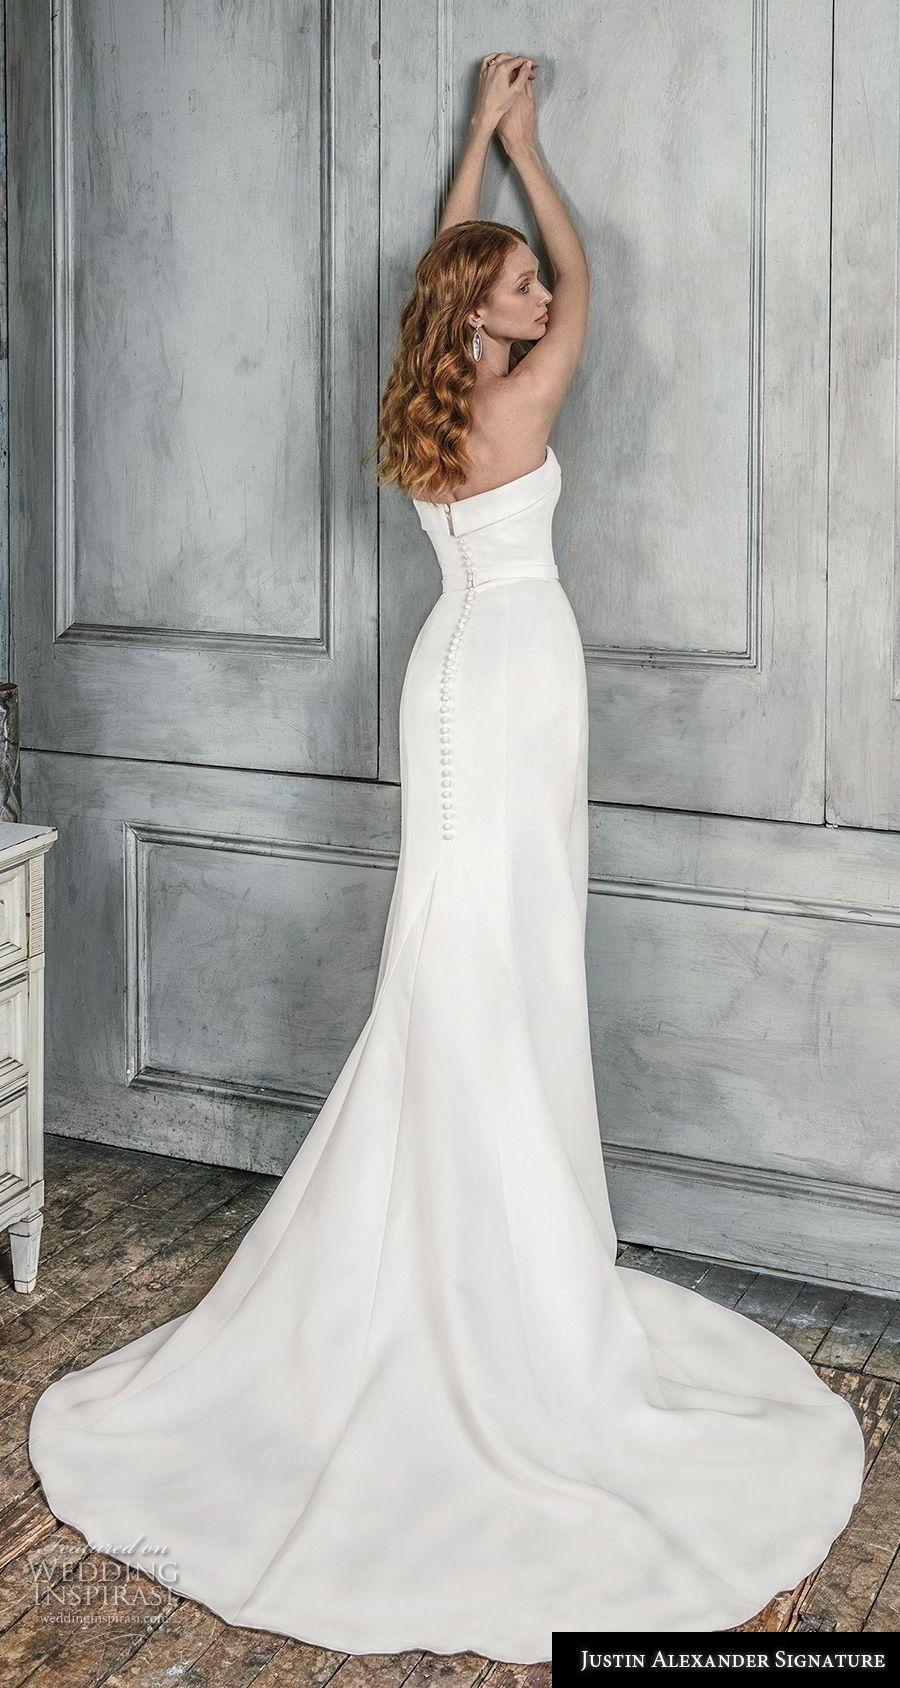 Simple elegant wedding dress designers  Justin Alexander Signature Fall  Wedding Dresses  Designer